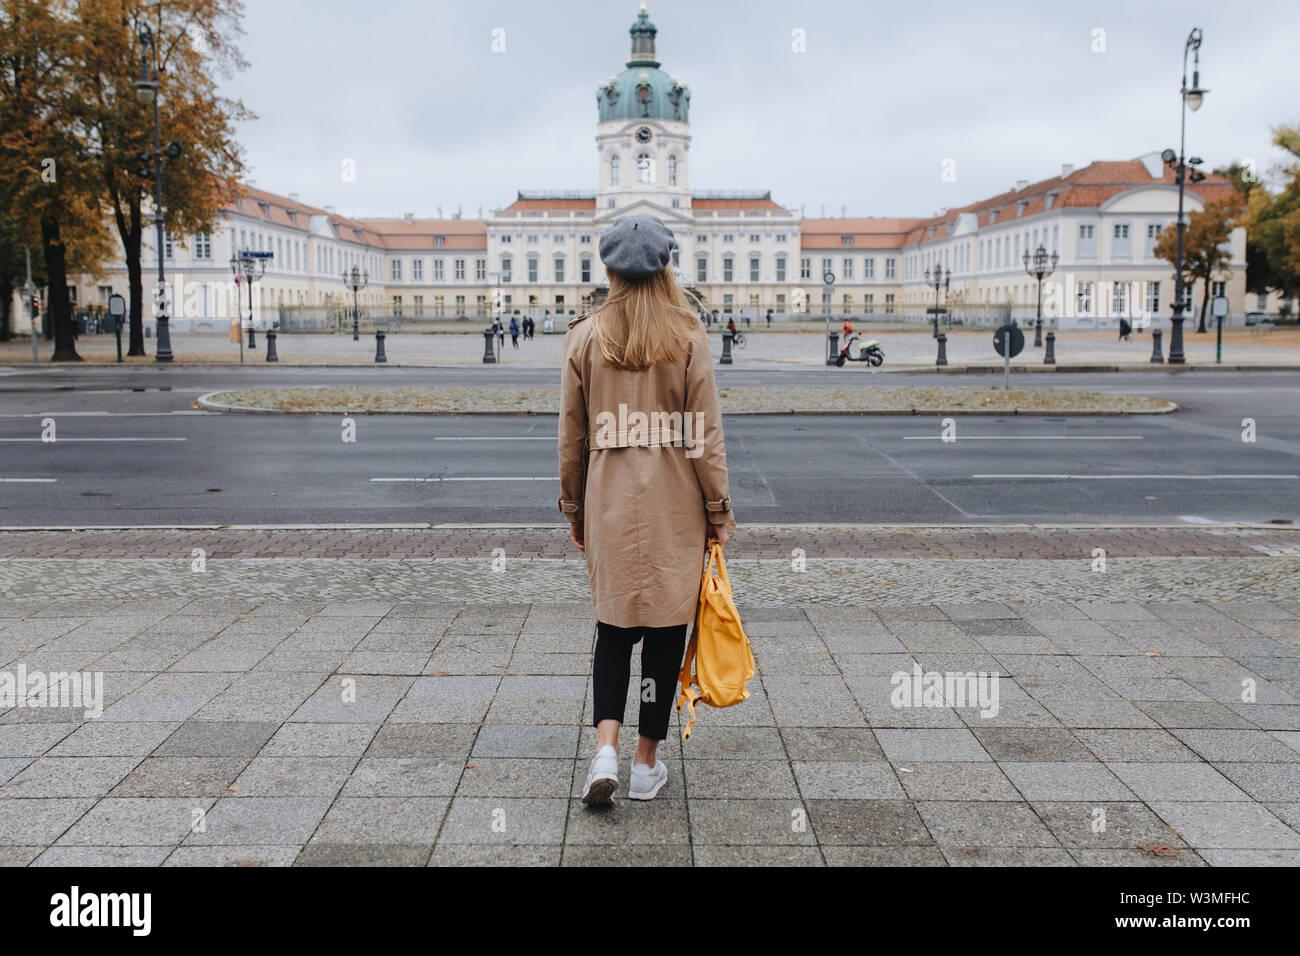 Young woman by Charlottenburg Palace - Stock Image